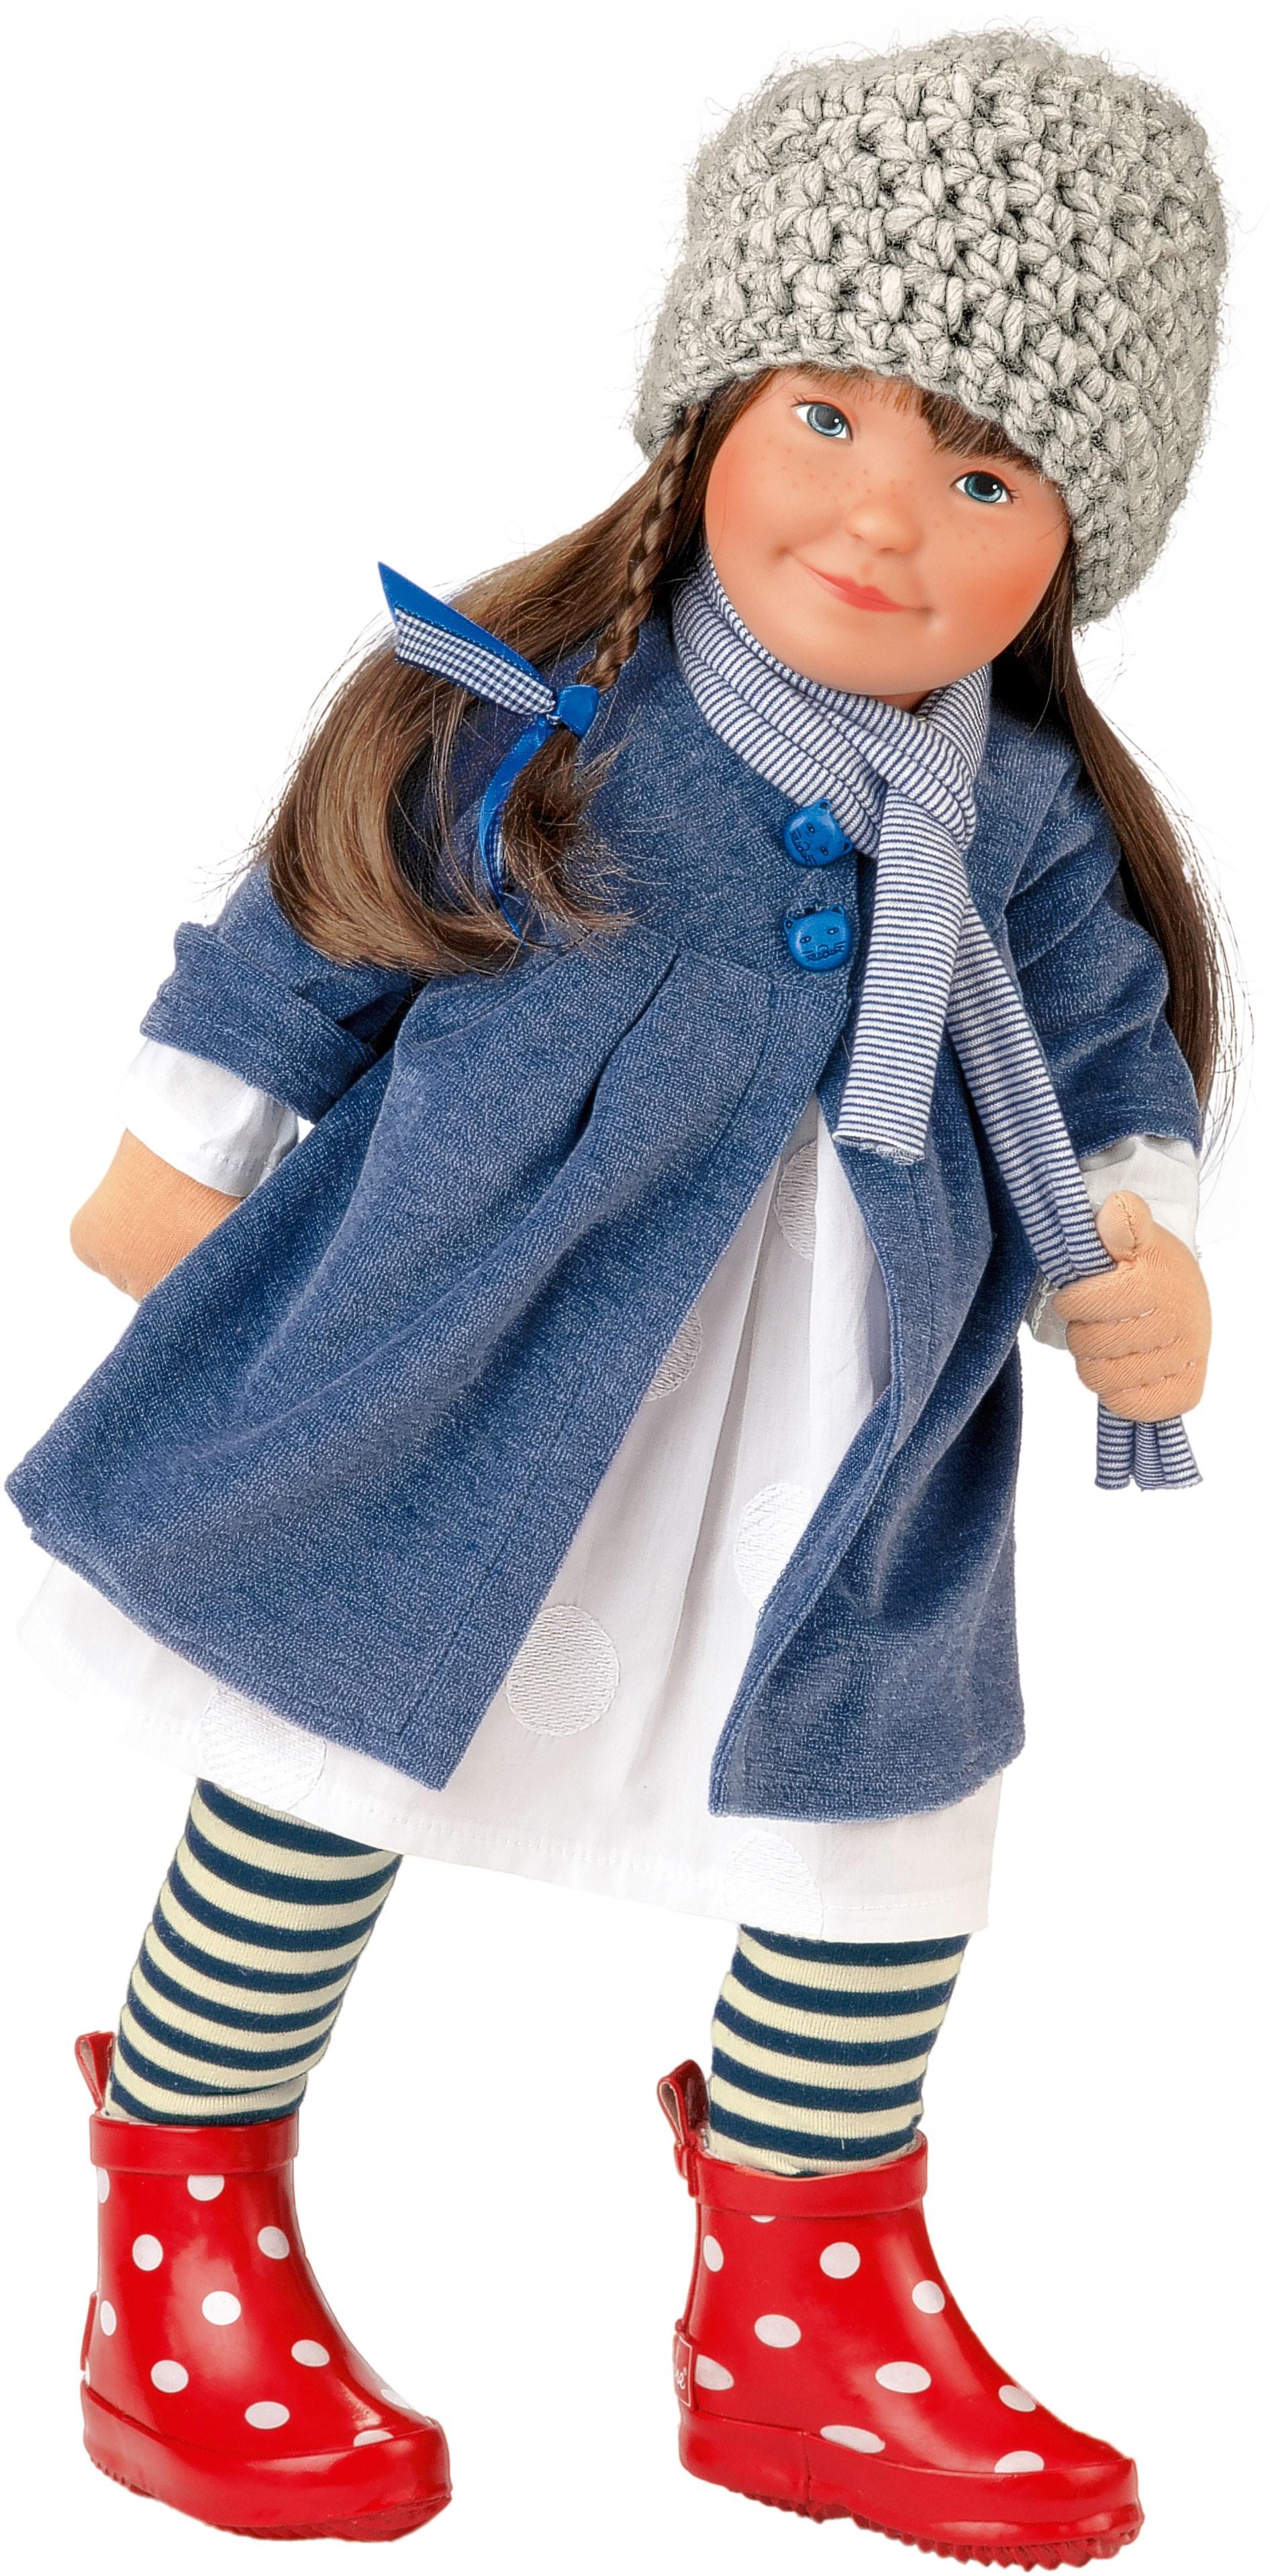 Kathe Kruse Elke Lolle Doll Eurosource